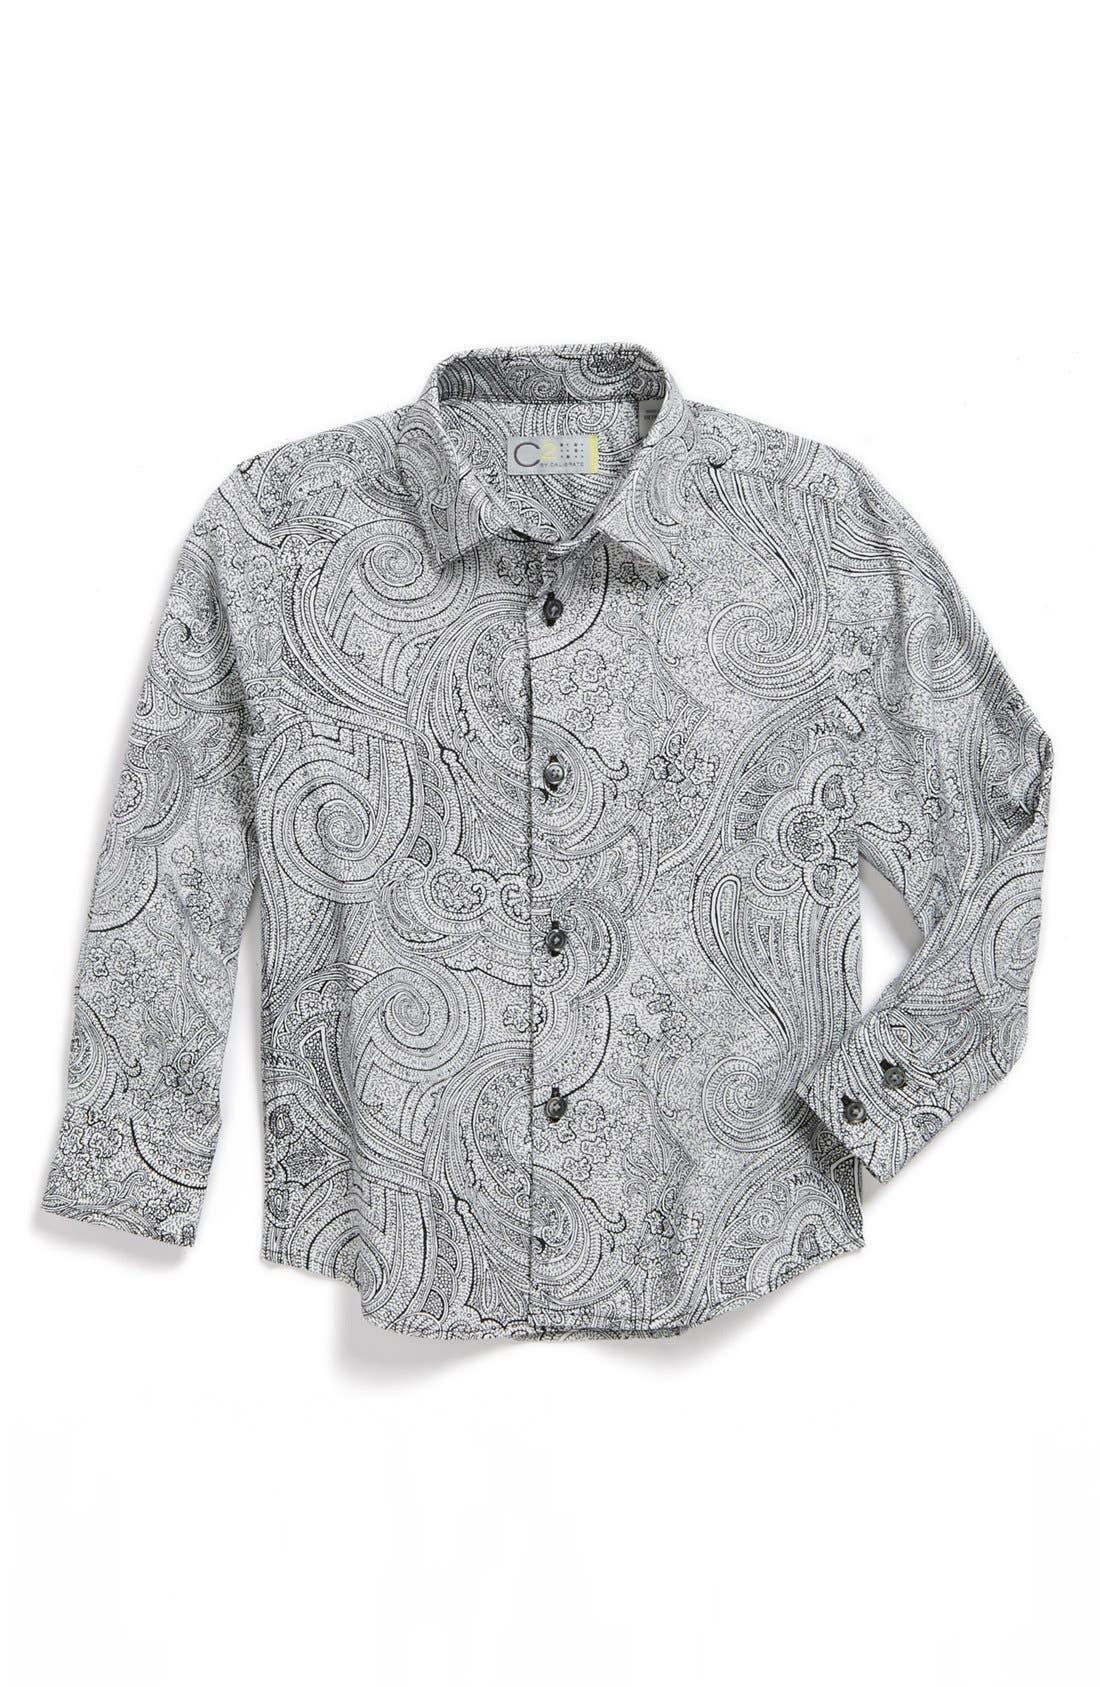 Alternate Image 1 Selected - C2 by Calibrate 'Carter' Dress Shirt (Toddler Boys)